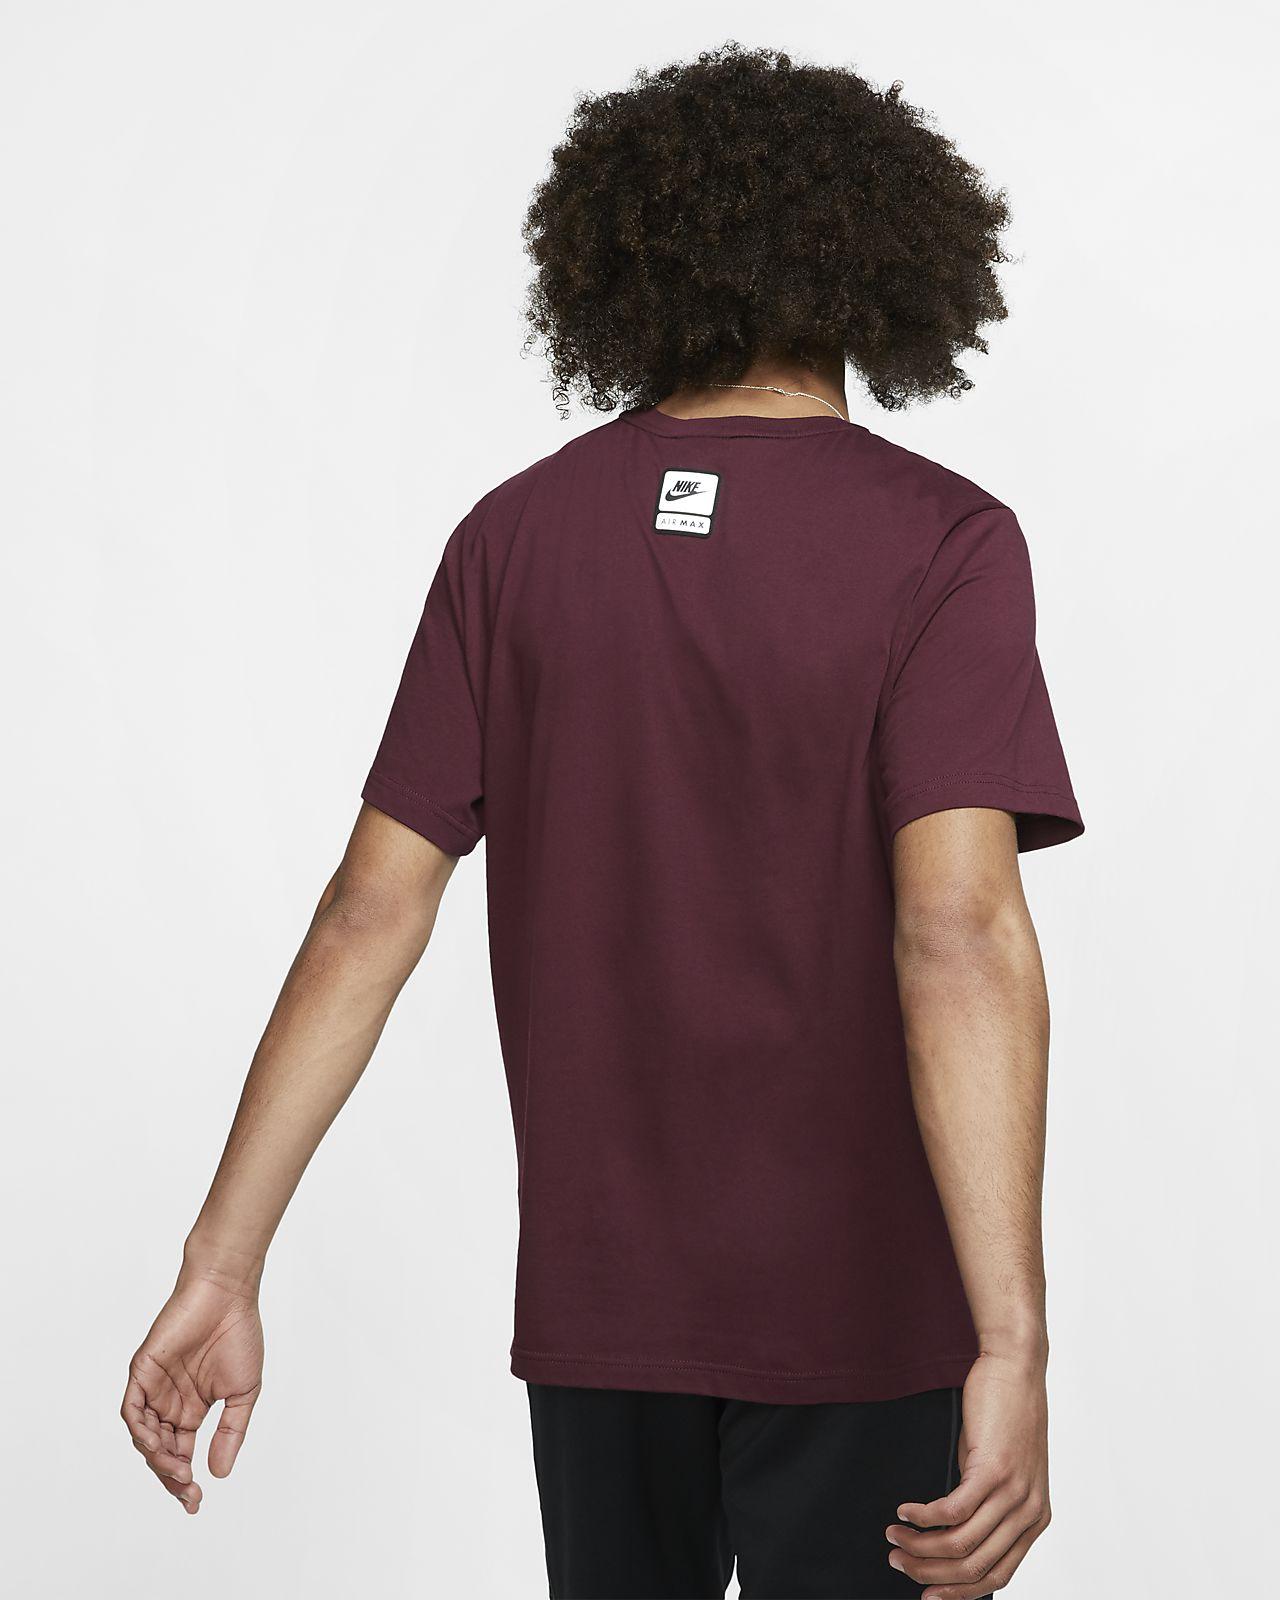 Nike Sportswear Air Max Men's Short Sleeve Graphic T Shirt